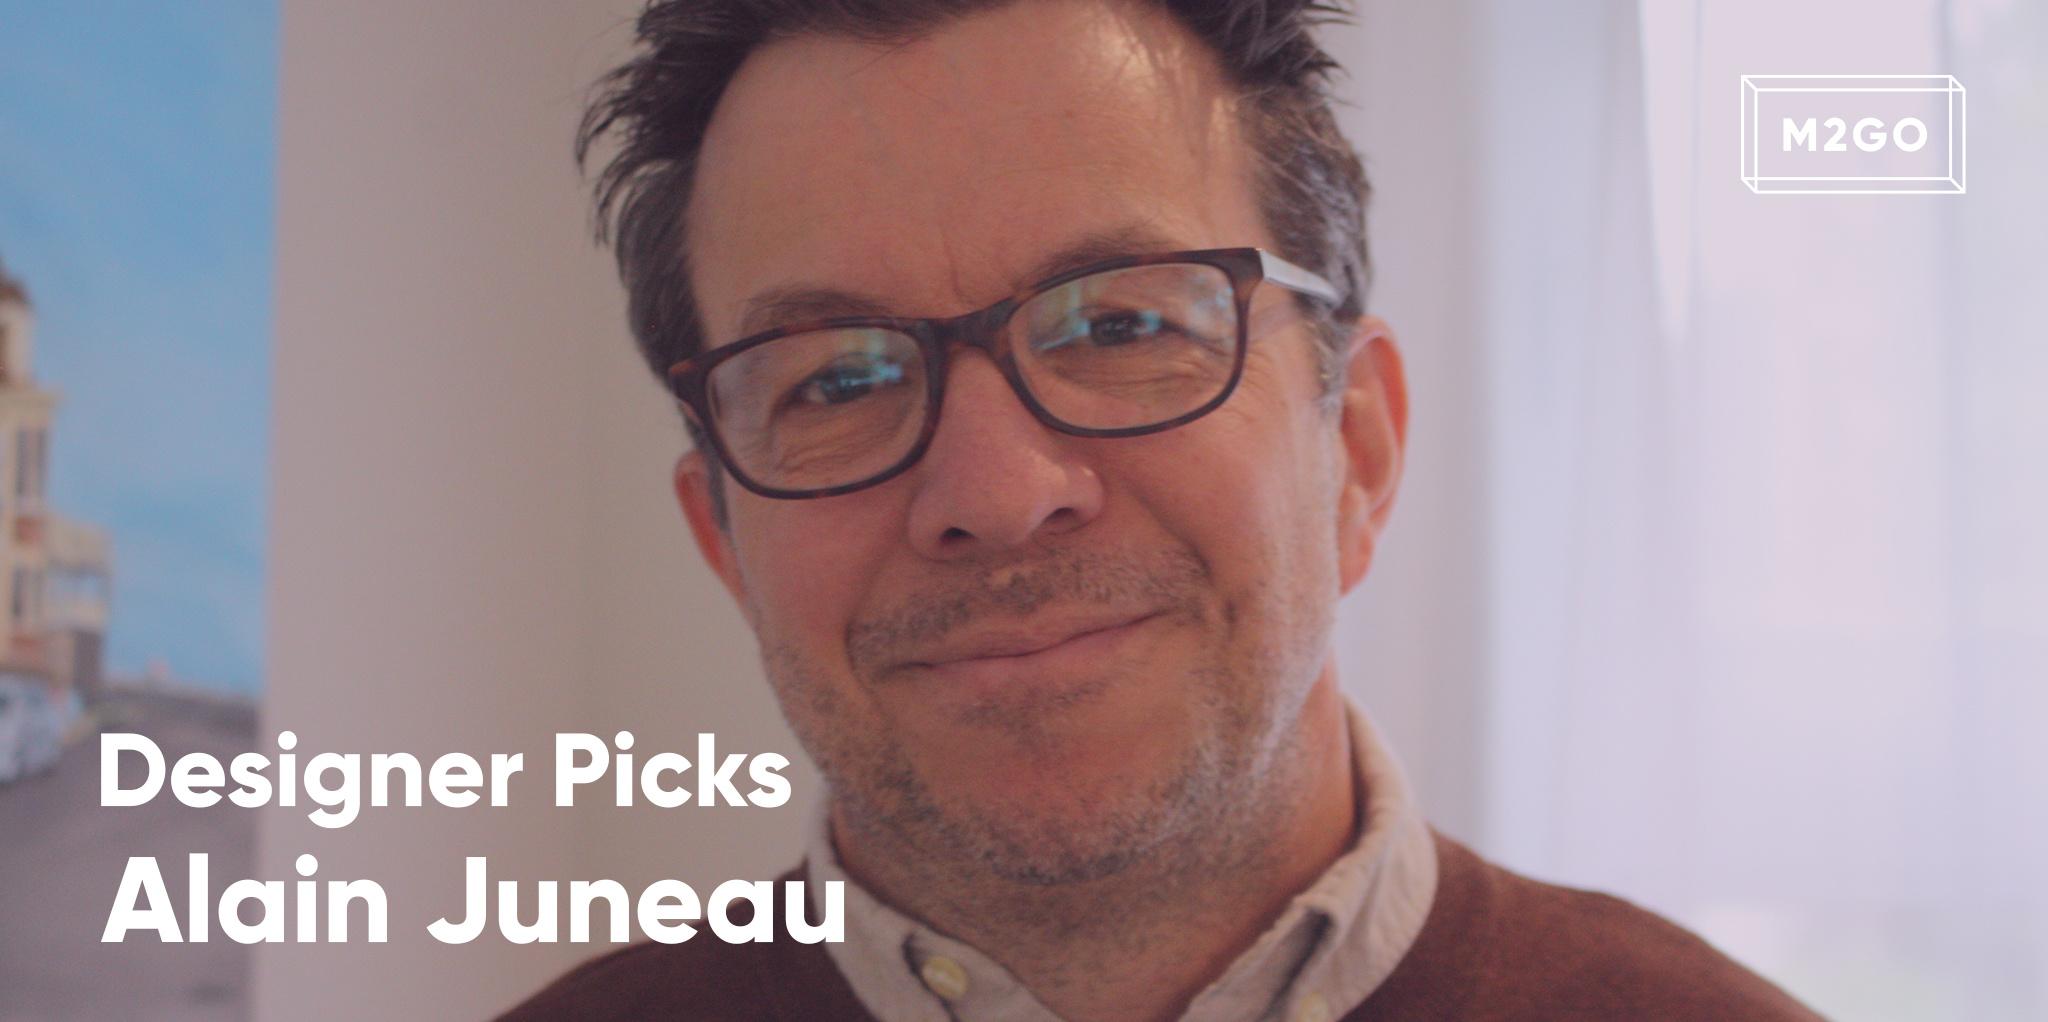 Designer Pick : Alain Juneau